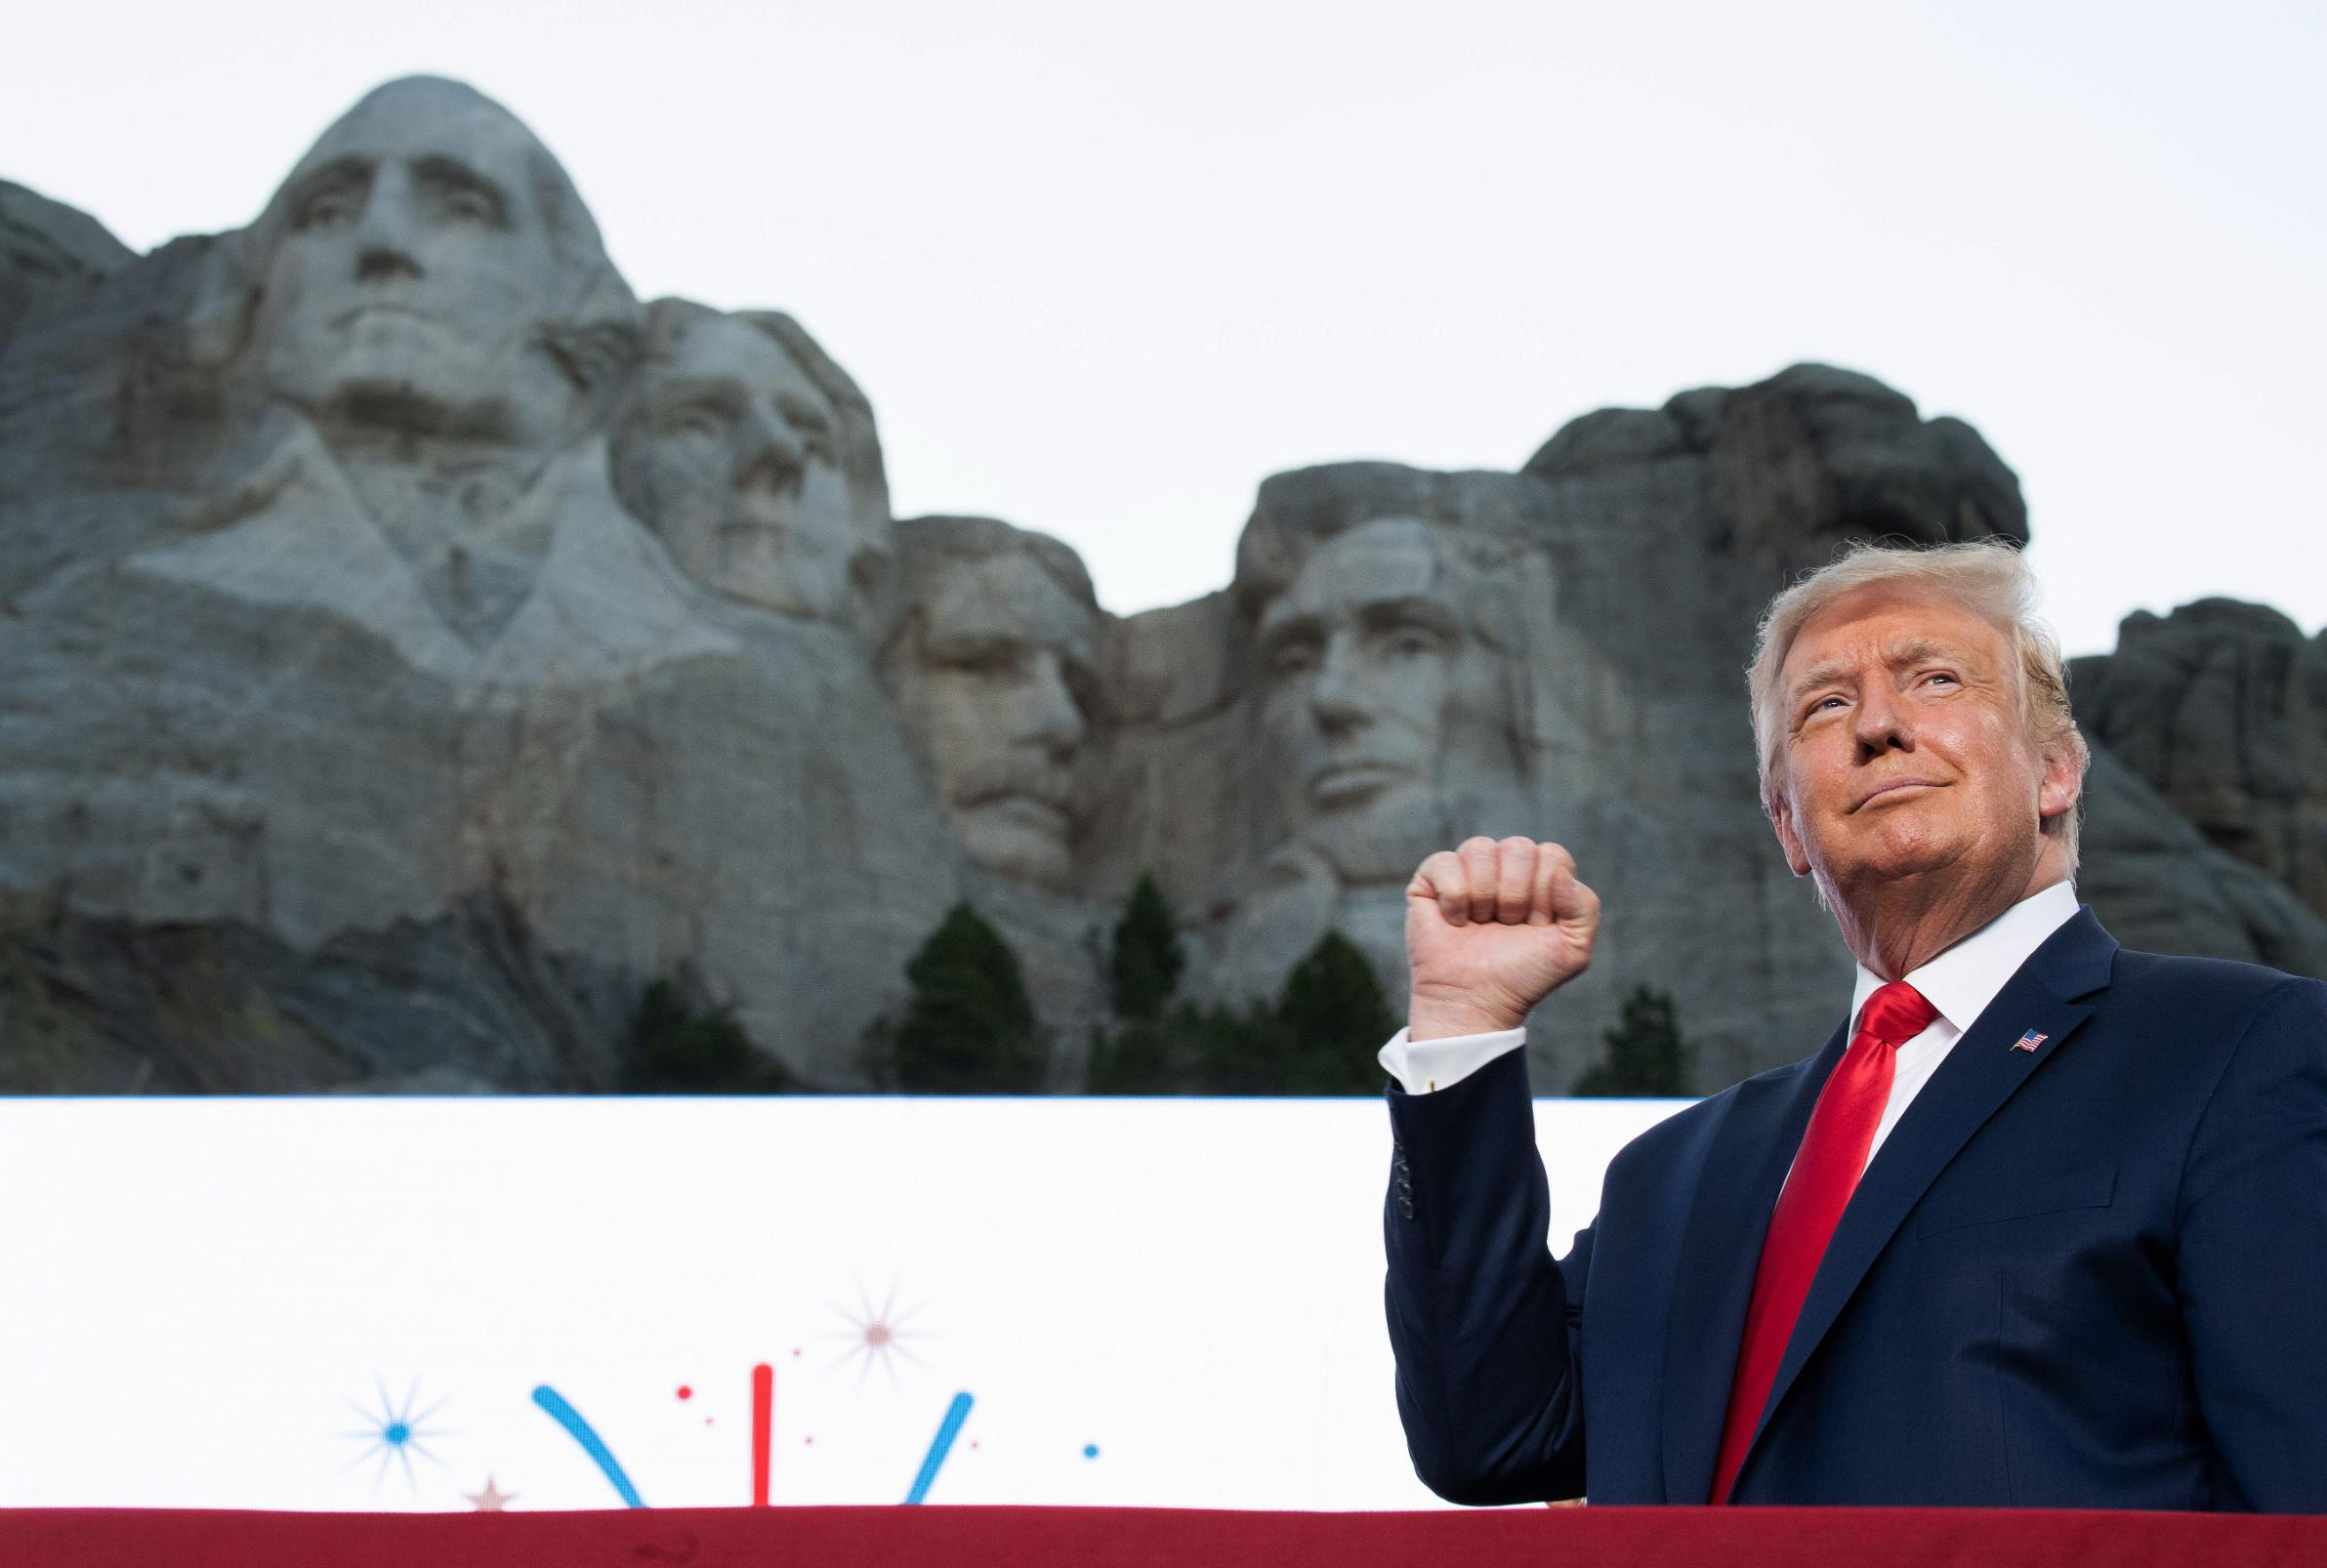 US President Donald Trump at Mount Rushmore.